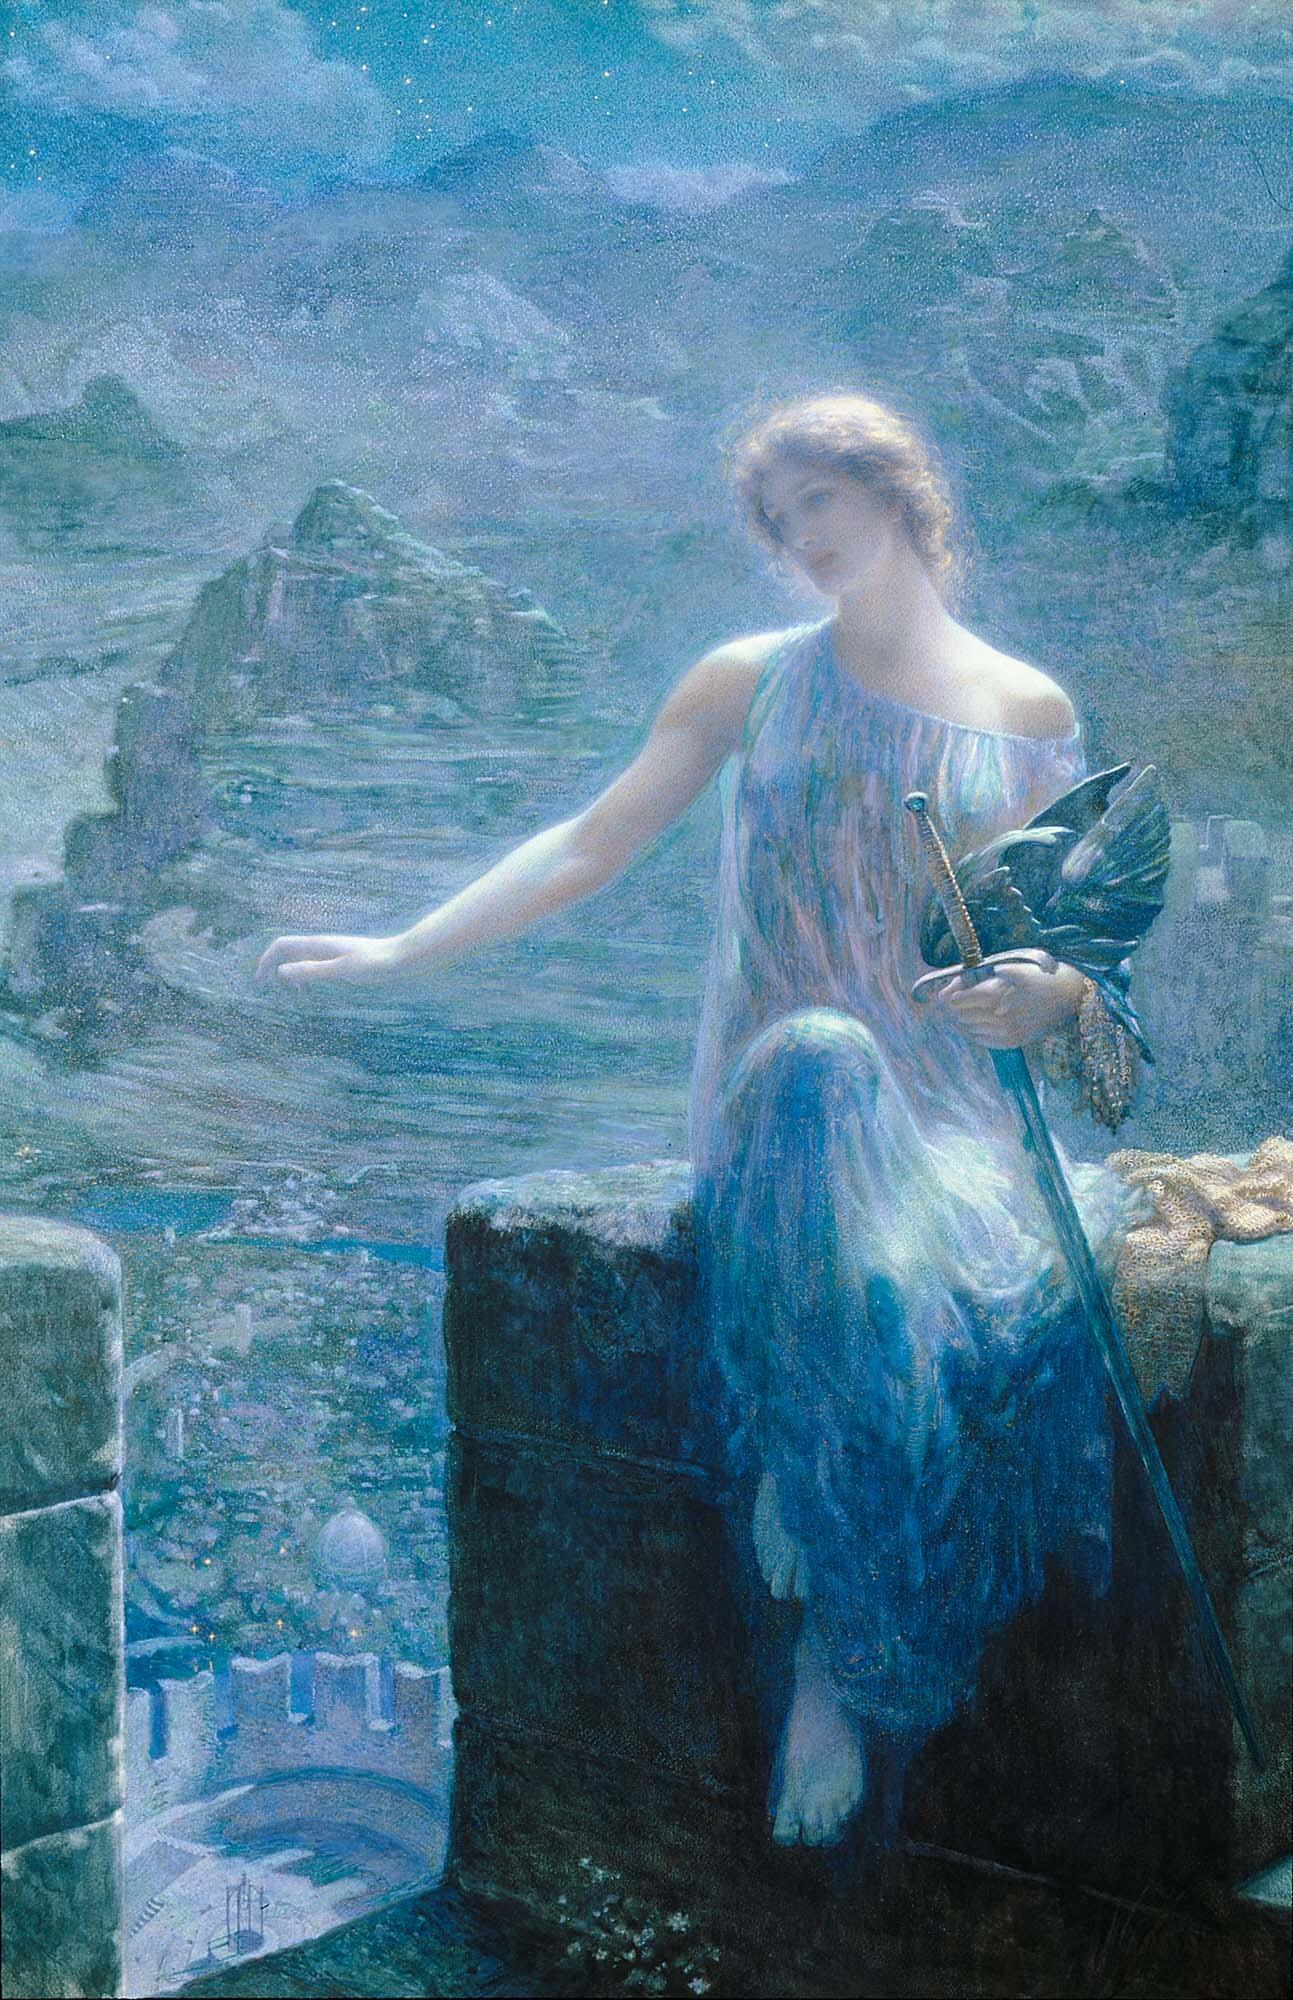 The Valkyre's Vigil (England, 1906), EDWARD ROBERT HUGHES